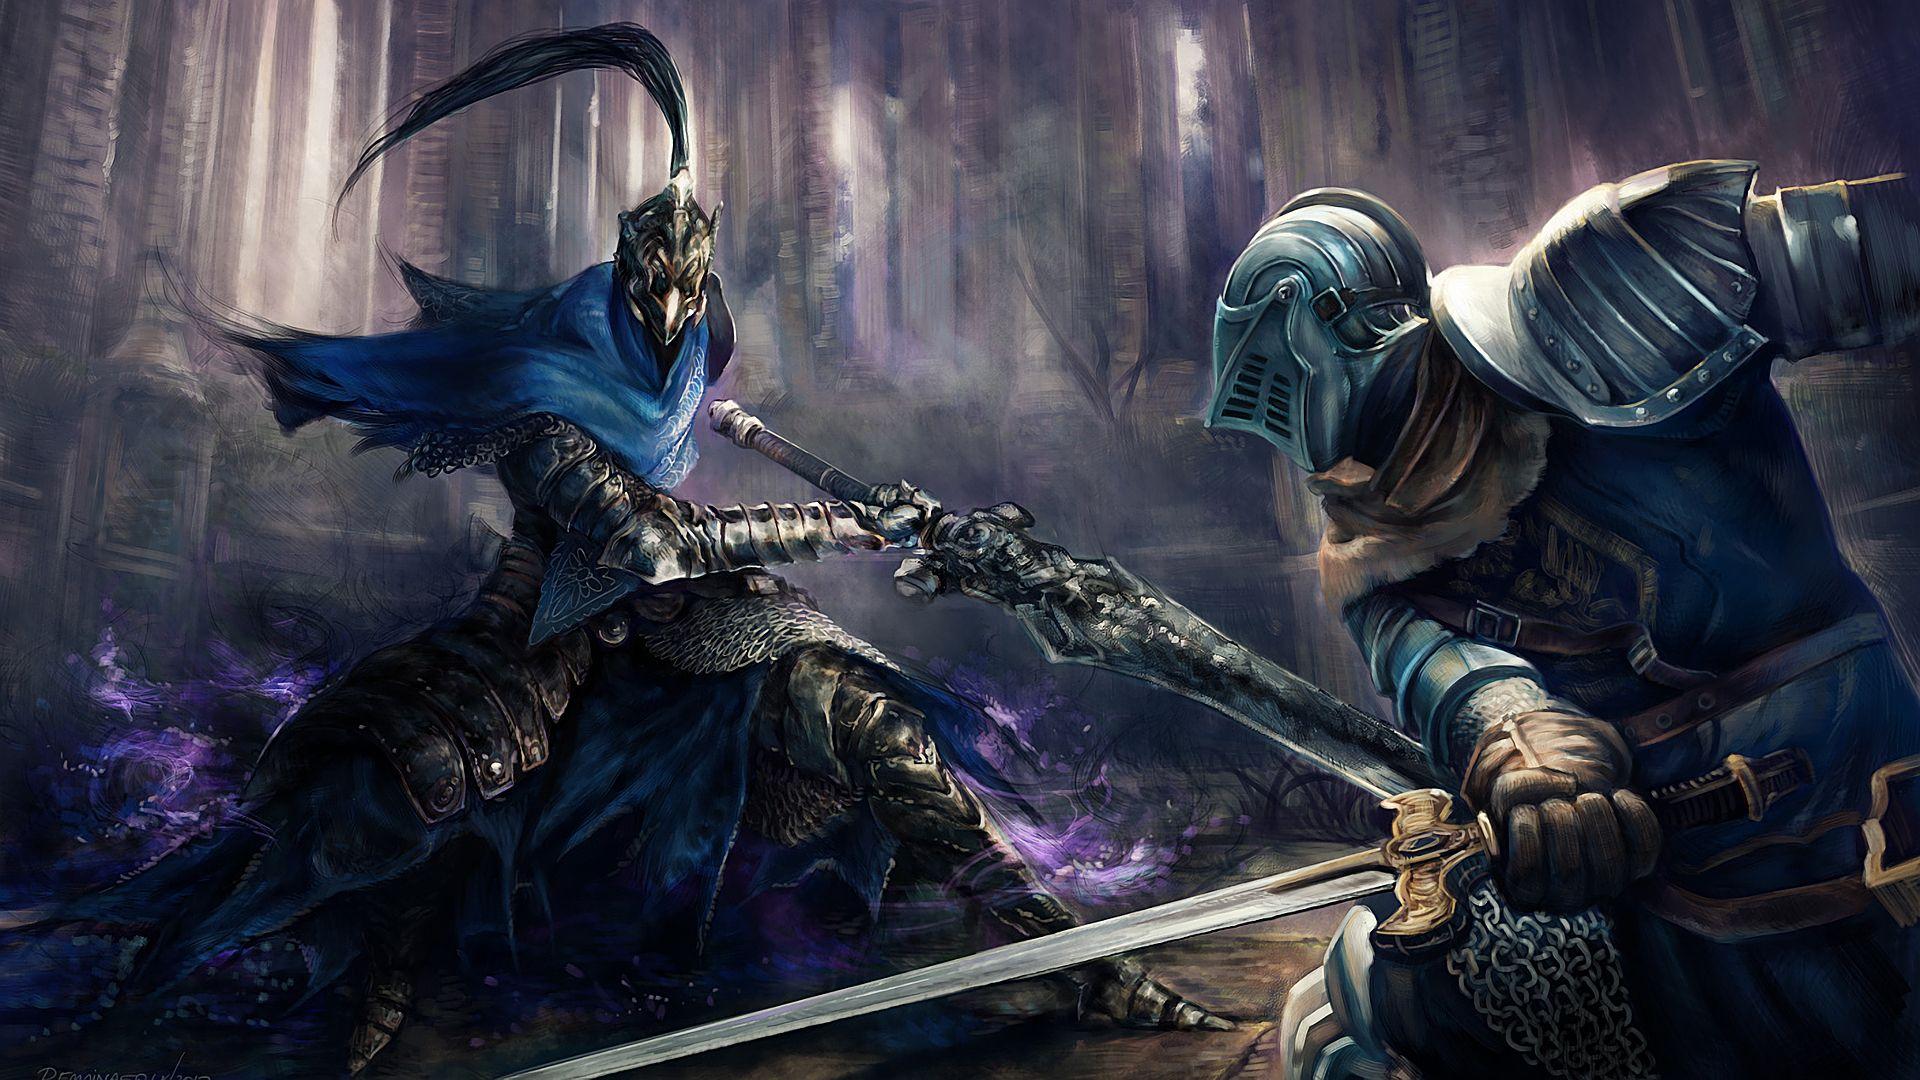 Dark Souls And Bloodborne Wallpaper Dump Spoilers Ahead Dark Souls Wallpaper Dark Souls Artorias Dark Souls